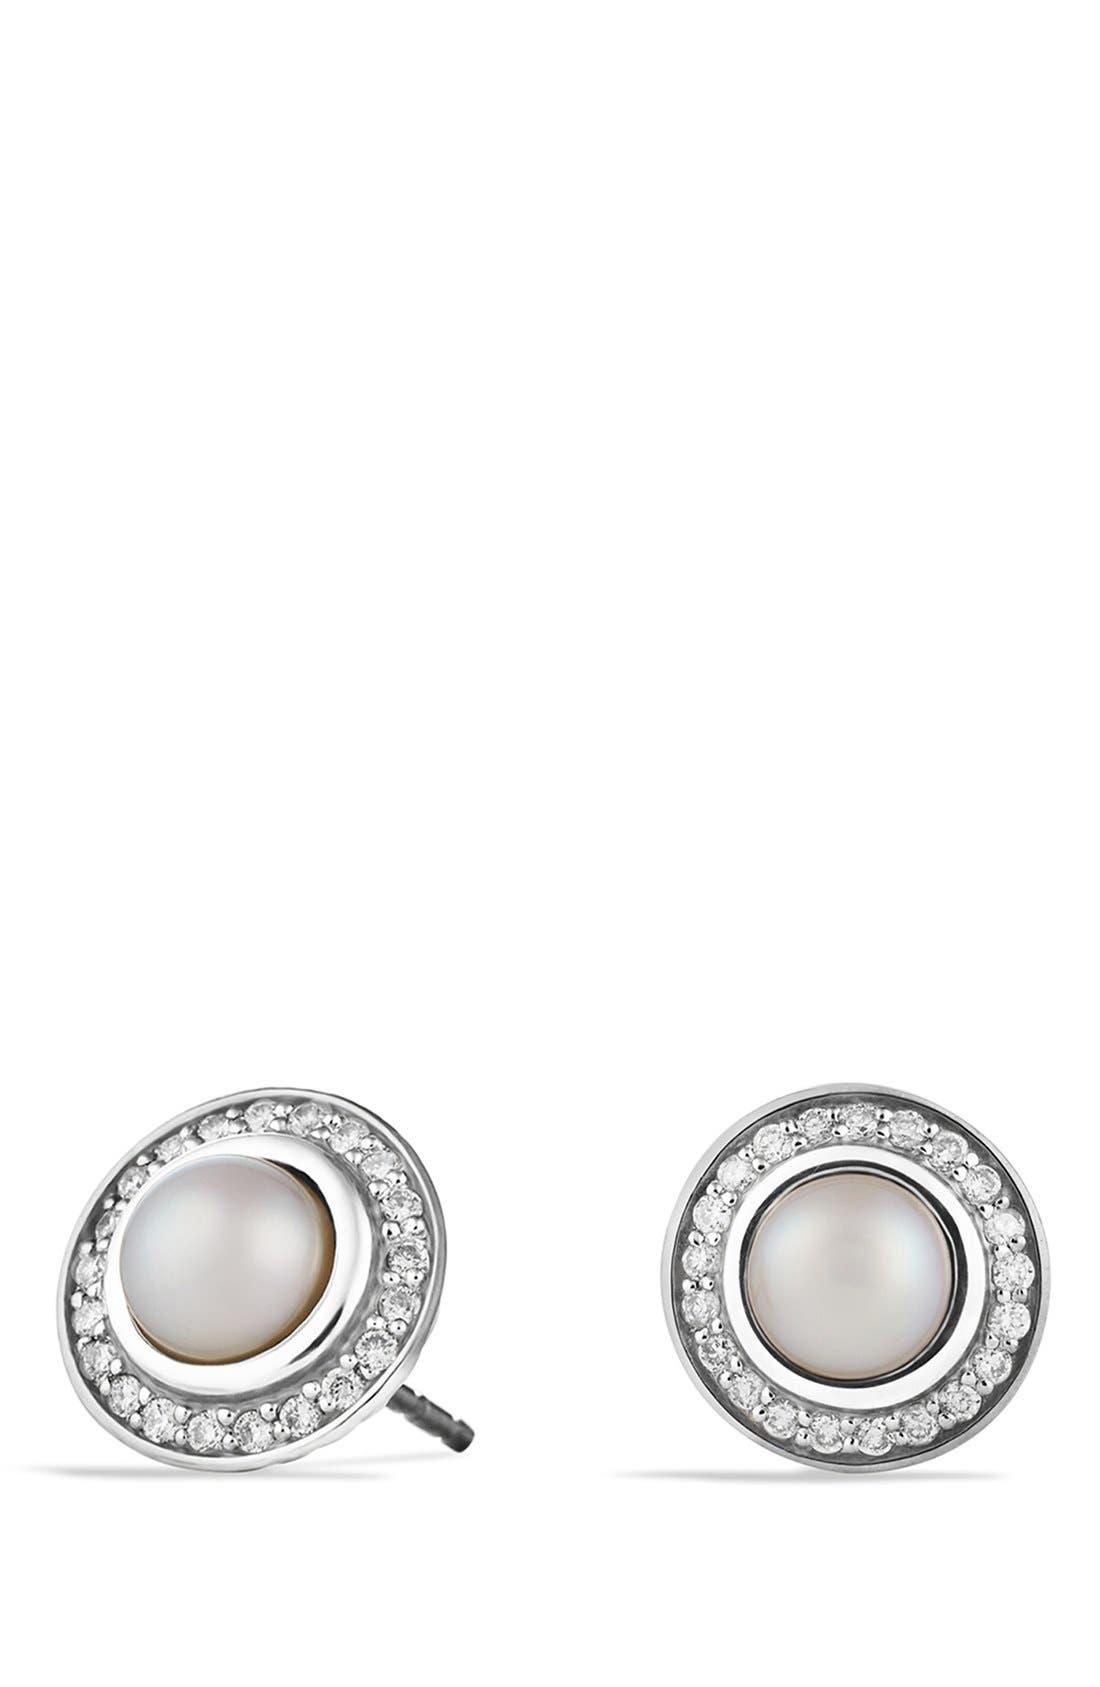 Alternate Image 1 Selected - David Yurman 'Cerise' Mini Earrings with Semiprecious Stone & Diamonds